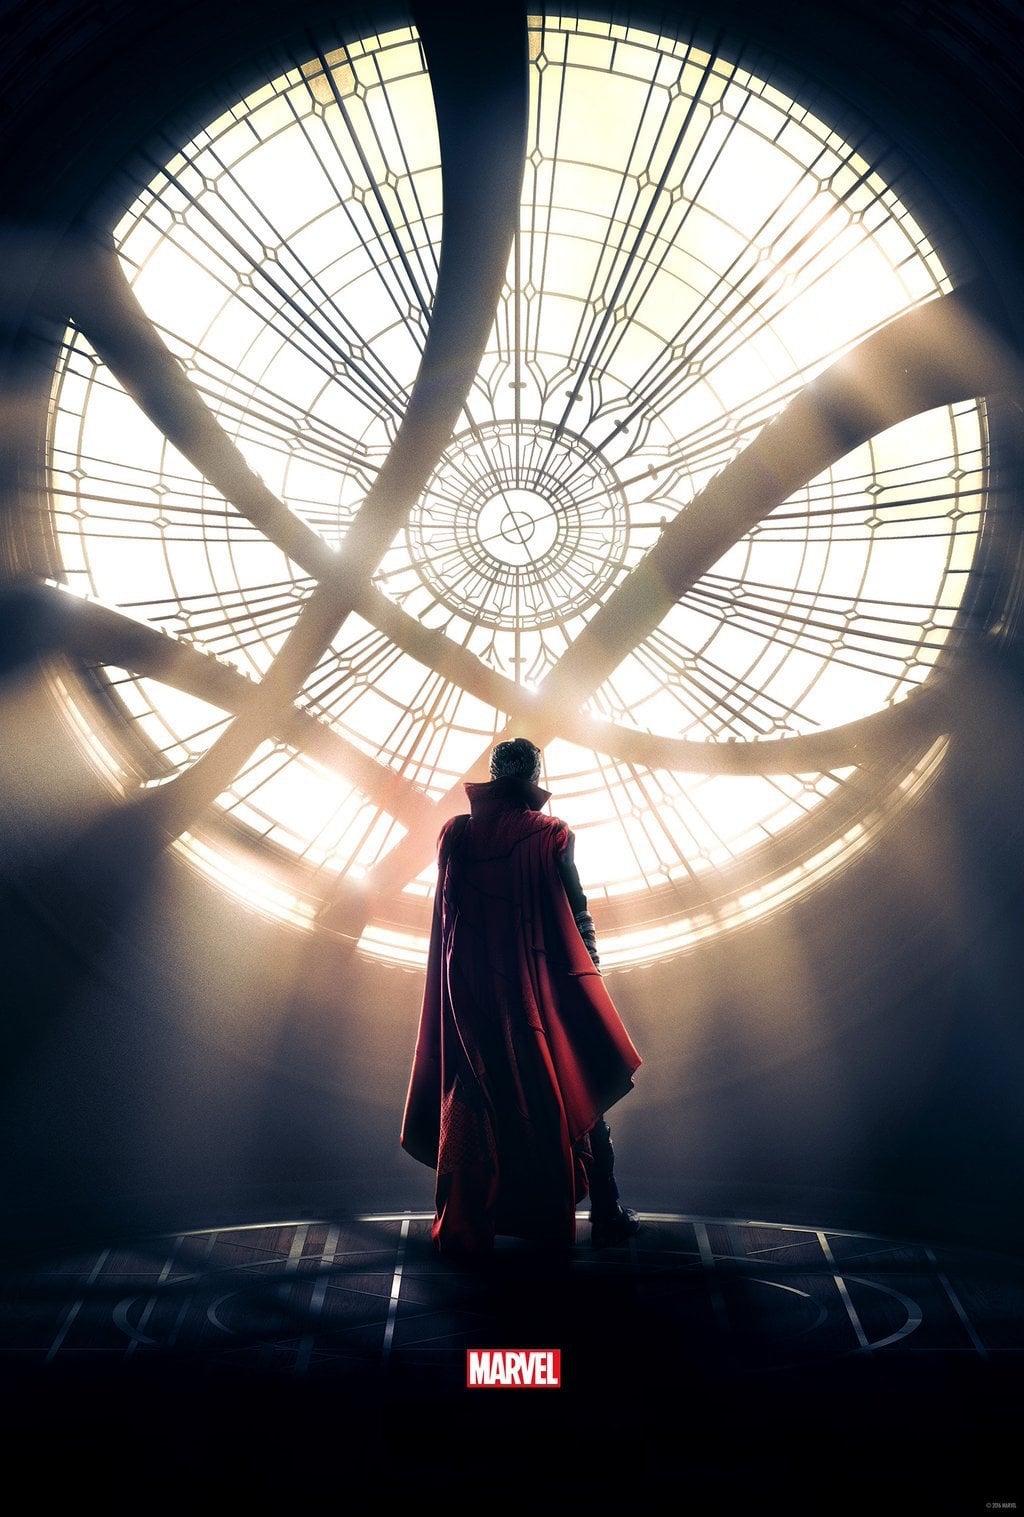 Hd Doctor Strange Watch 2016 Online Film